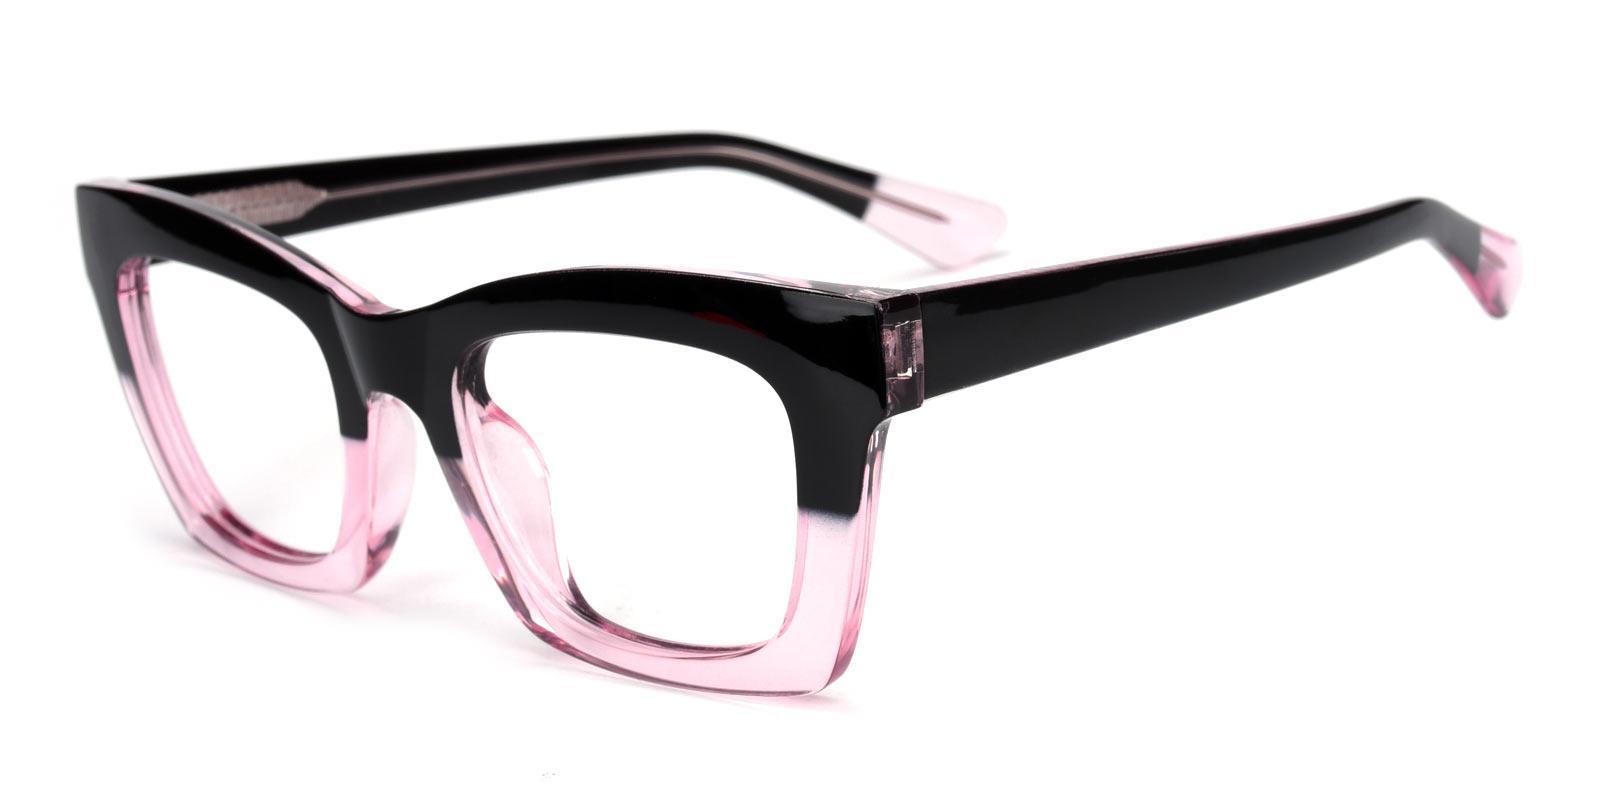 Catlady-Pink-Cat / Rectangle-Acetate-Eyeglasses-detail